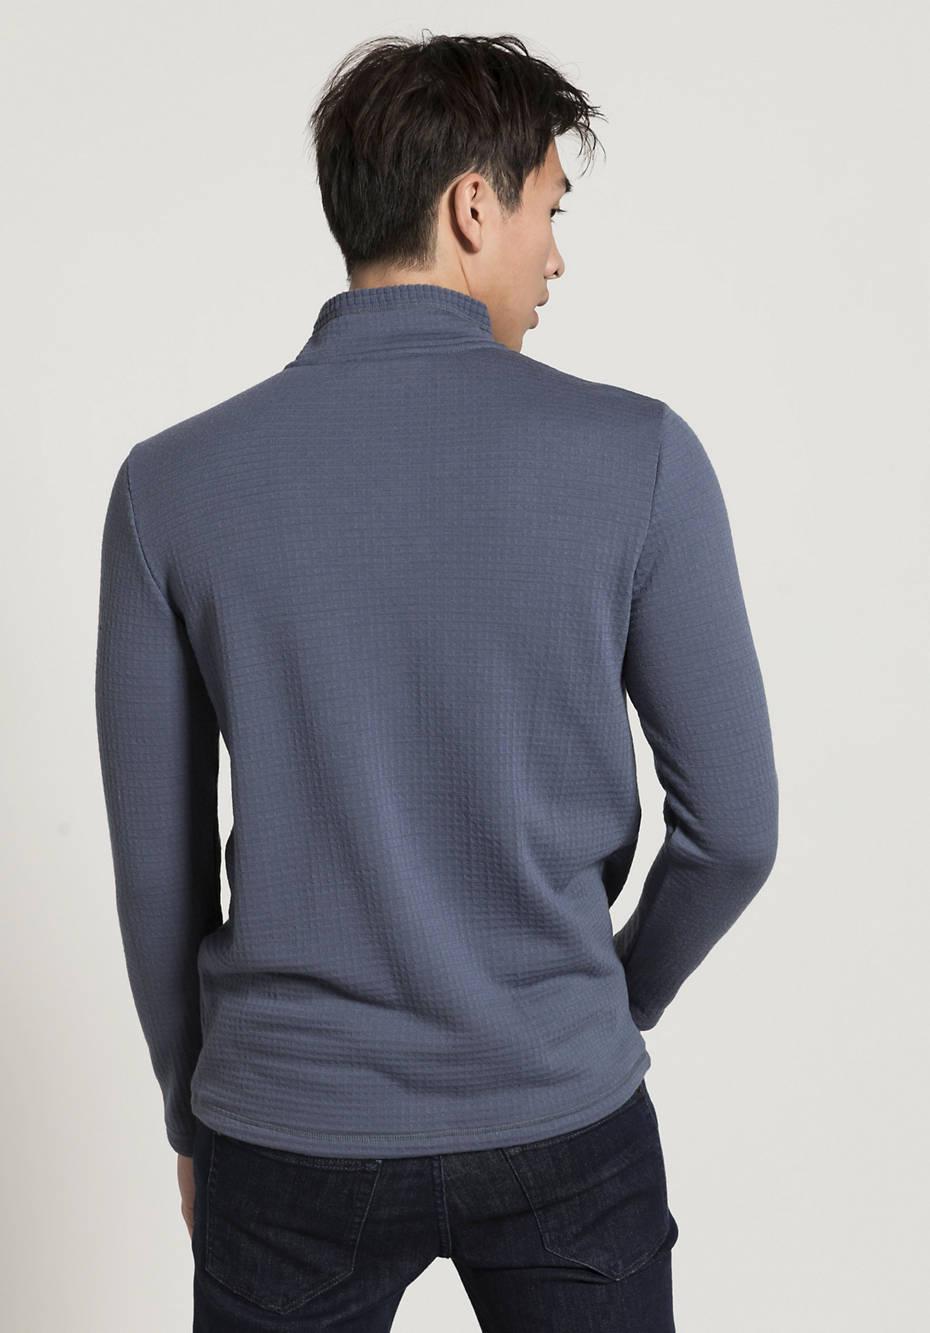 Longsleeve made of pure organic merino wool